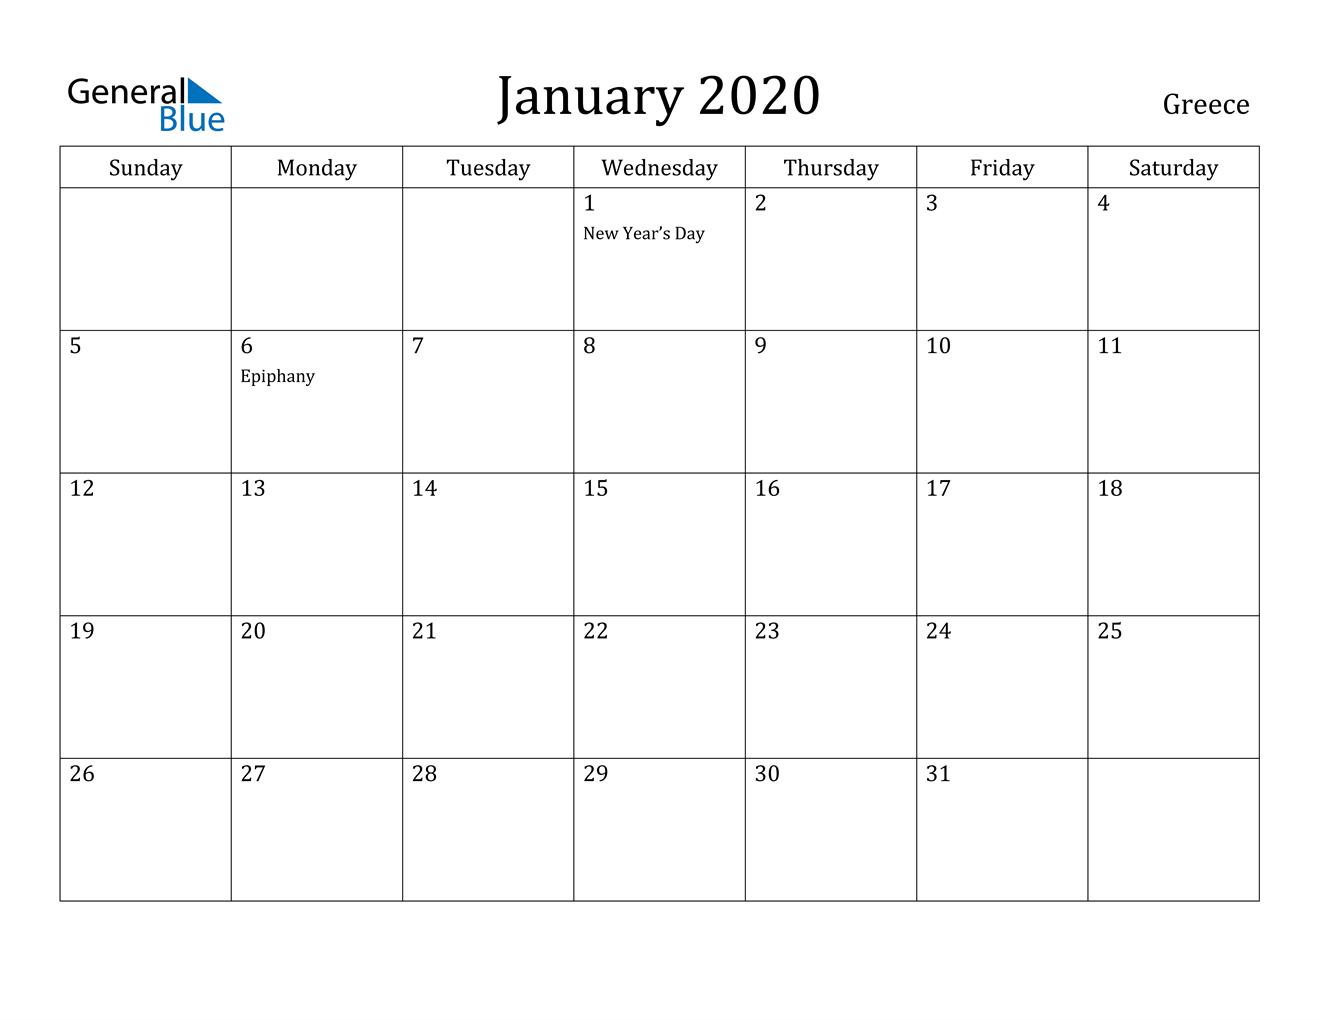 January 2020 Calendar - Greece